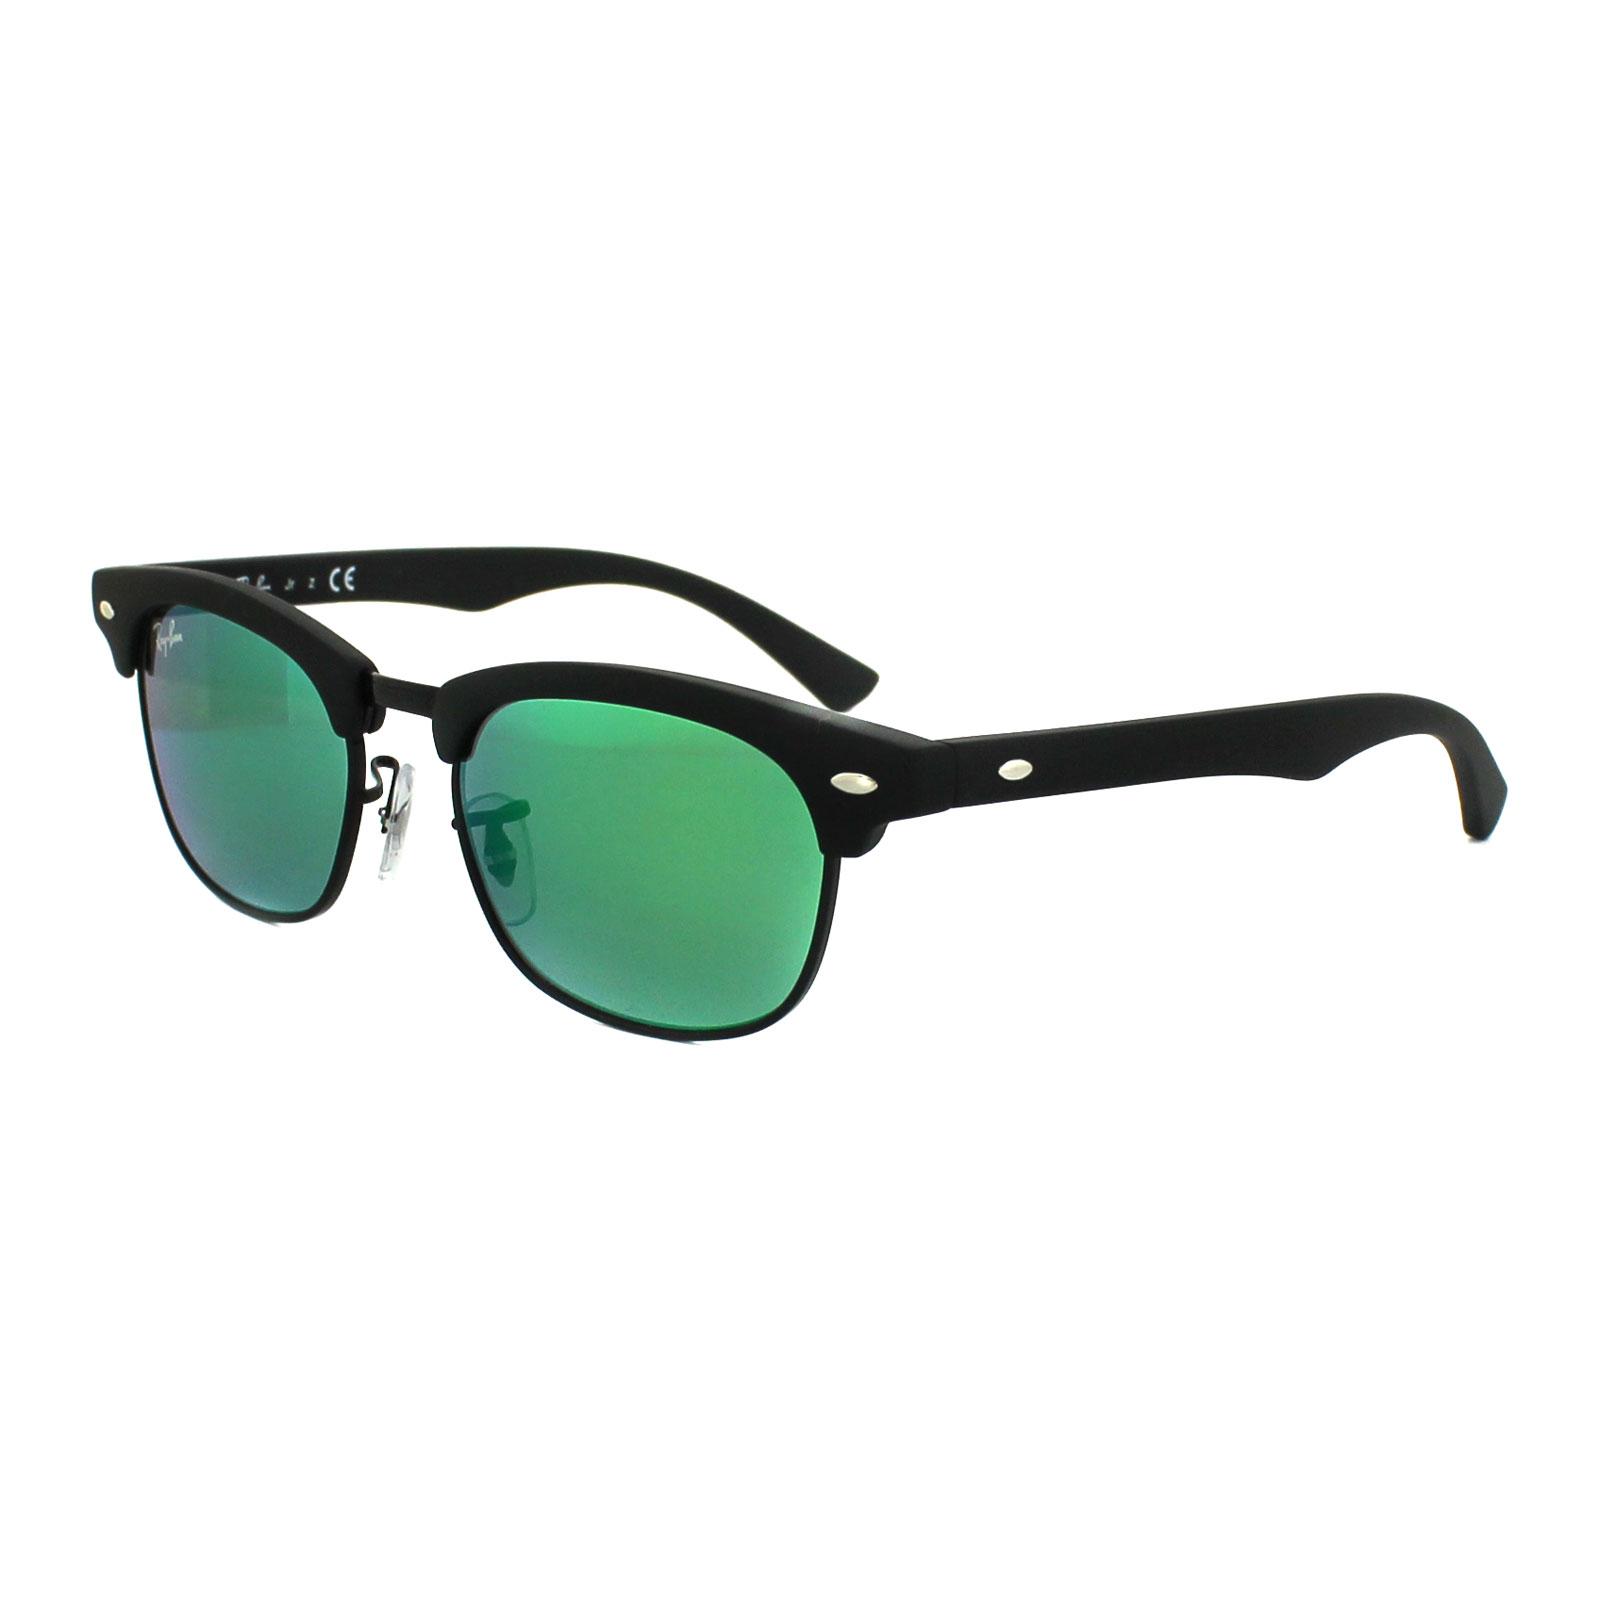 60d7b8d612c Black Ray Bans Sunglasses Ebay Uk